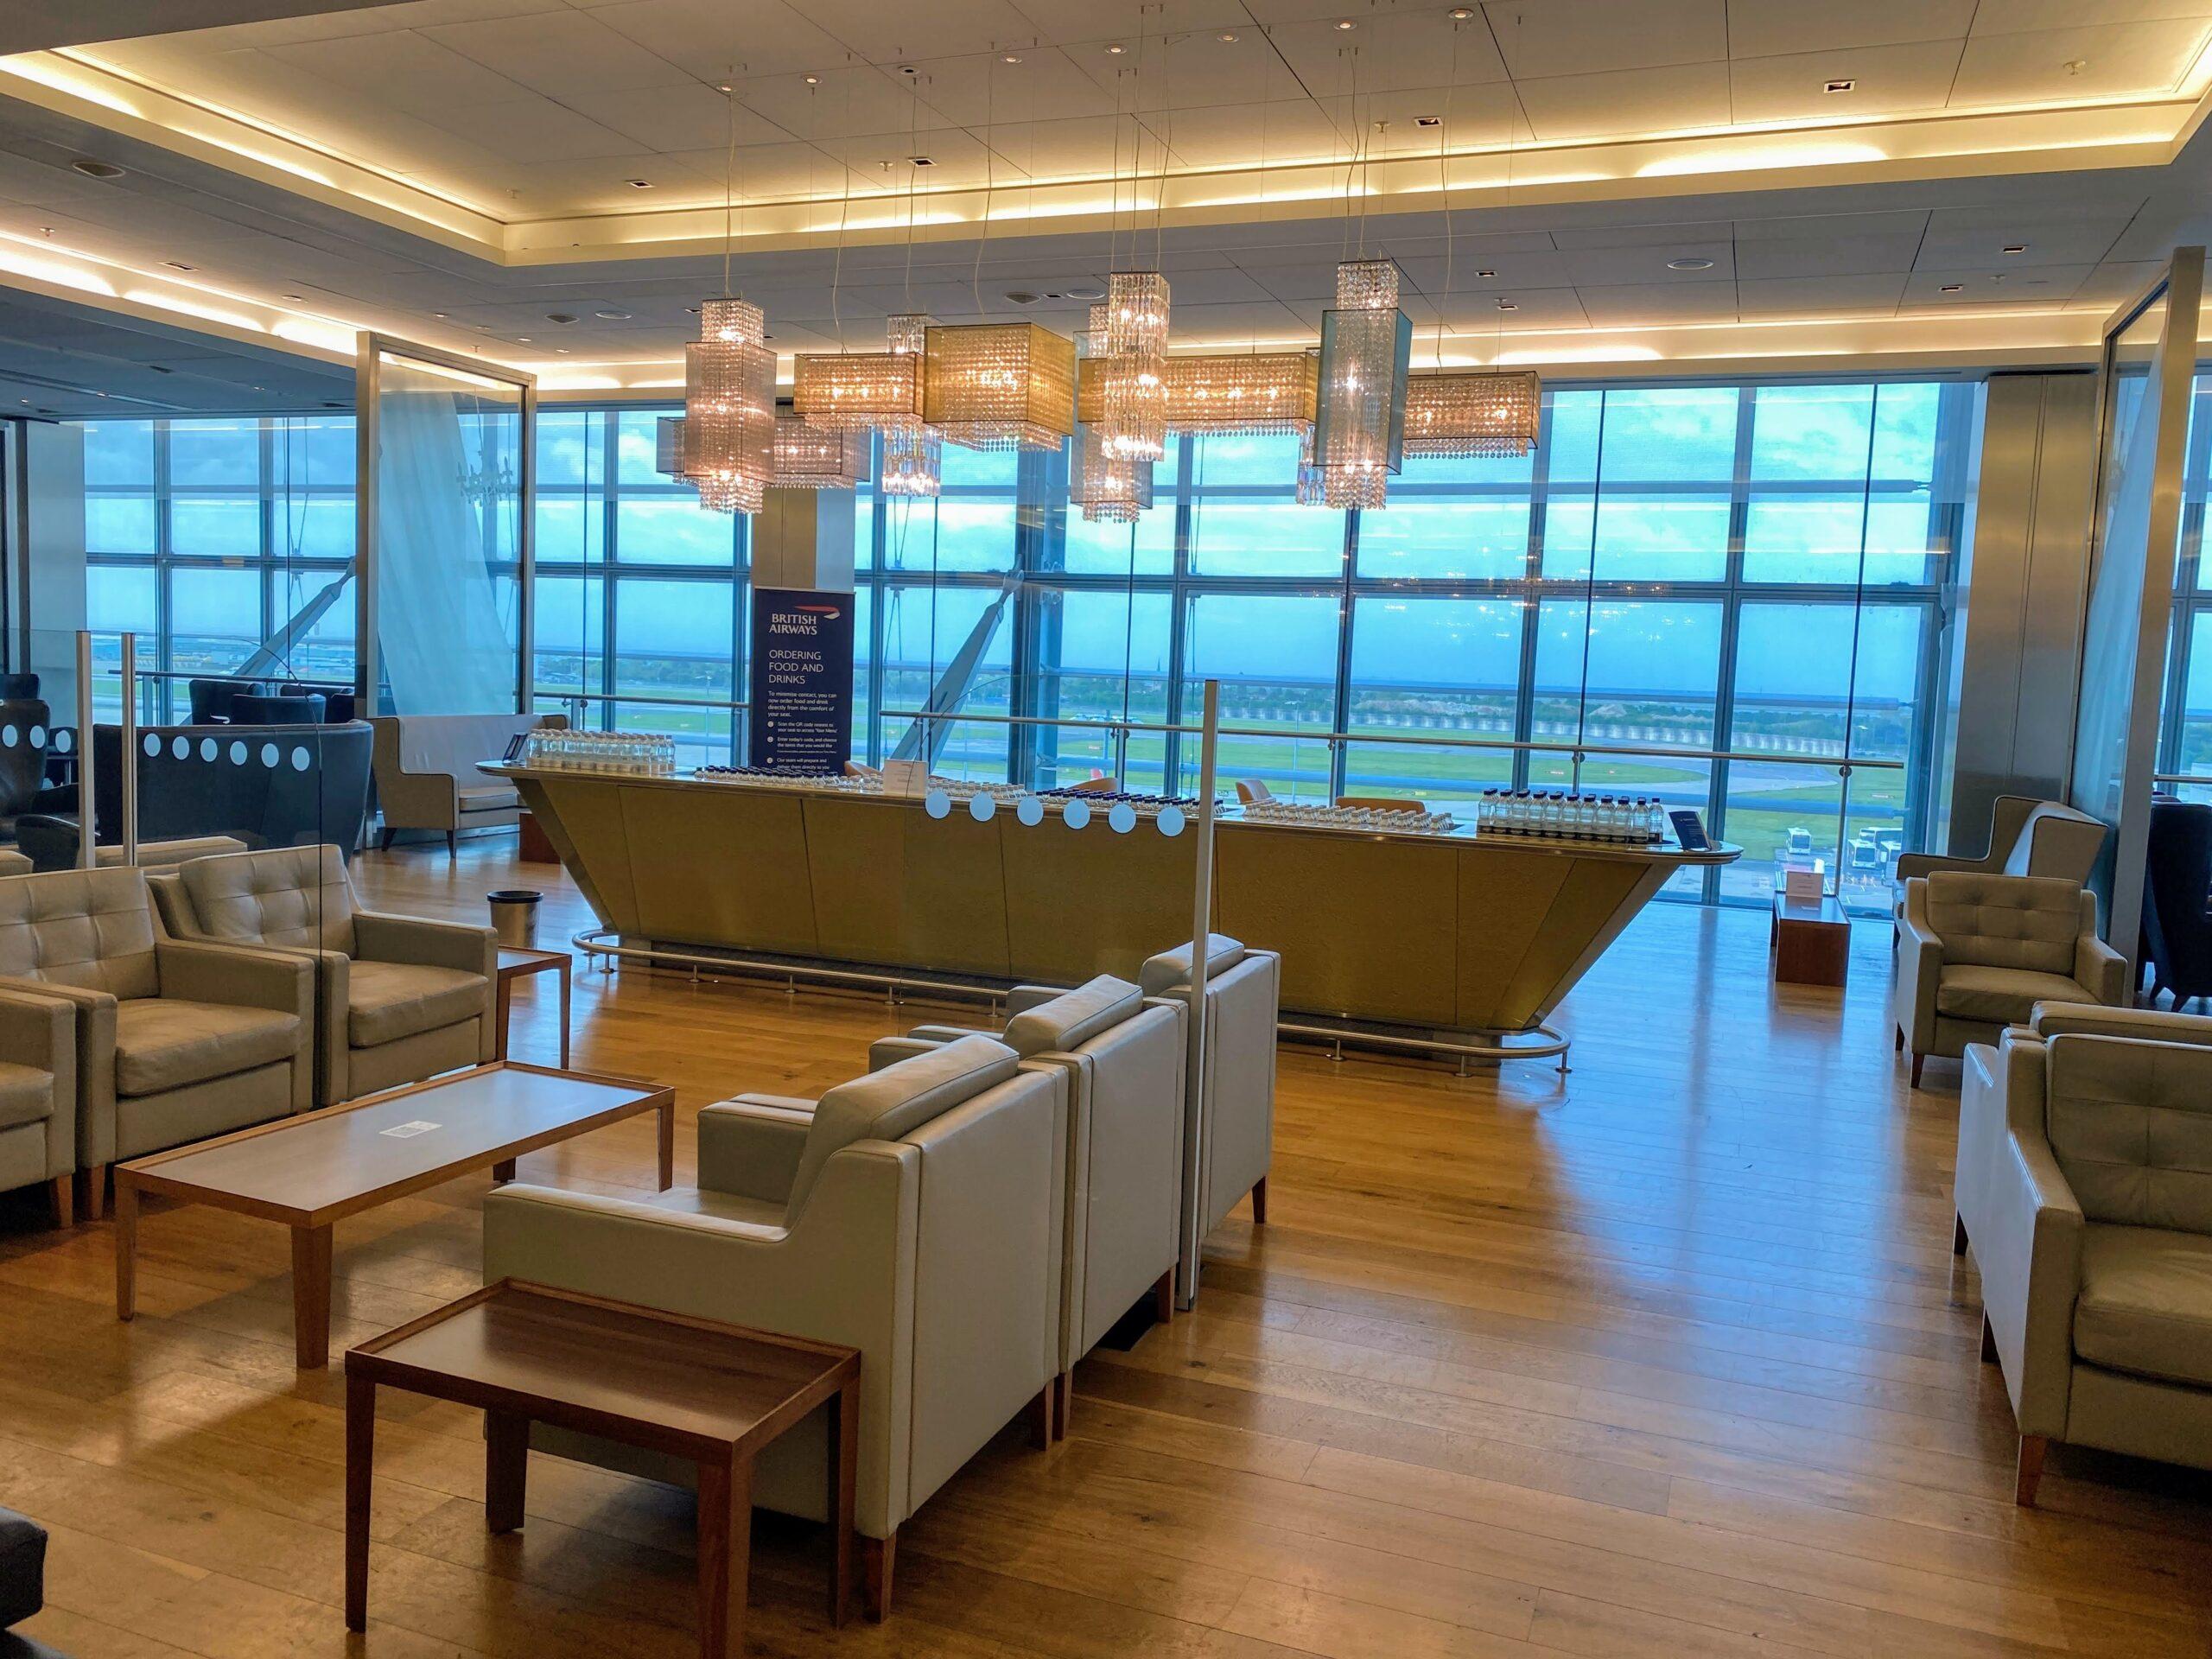 BA First lounge heathrow may 21